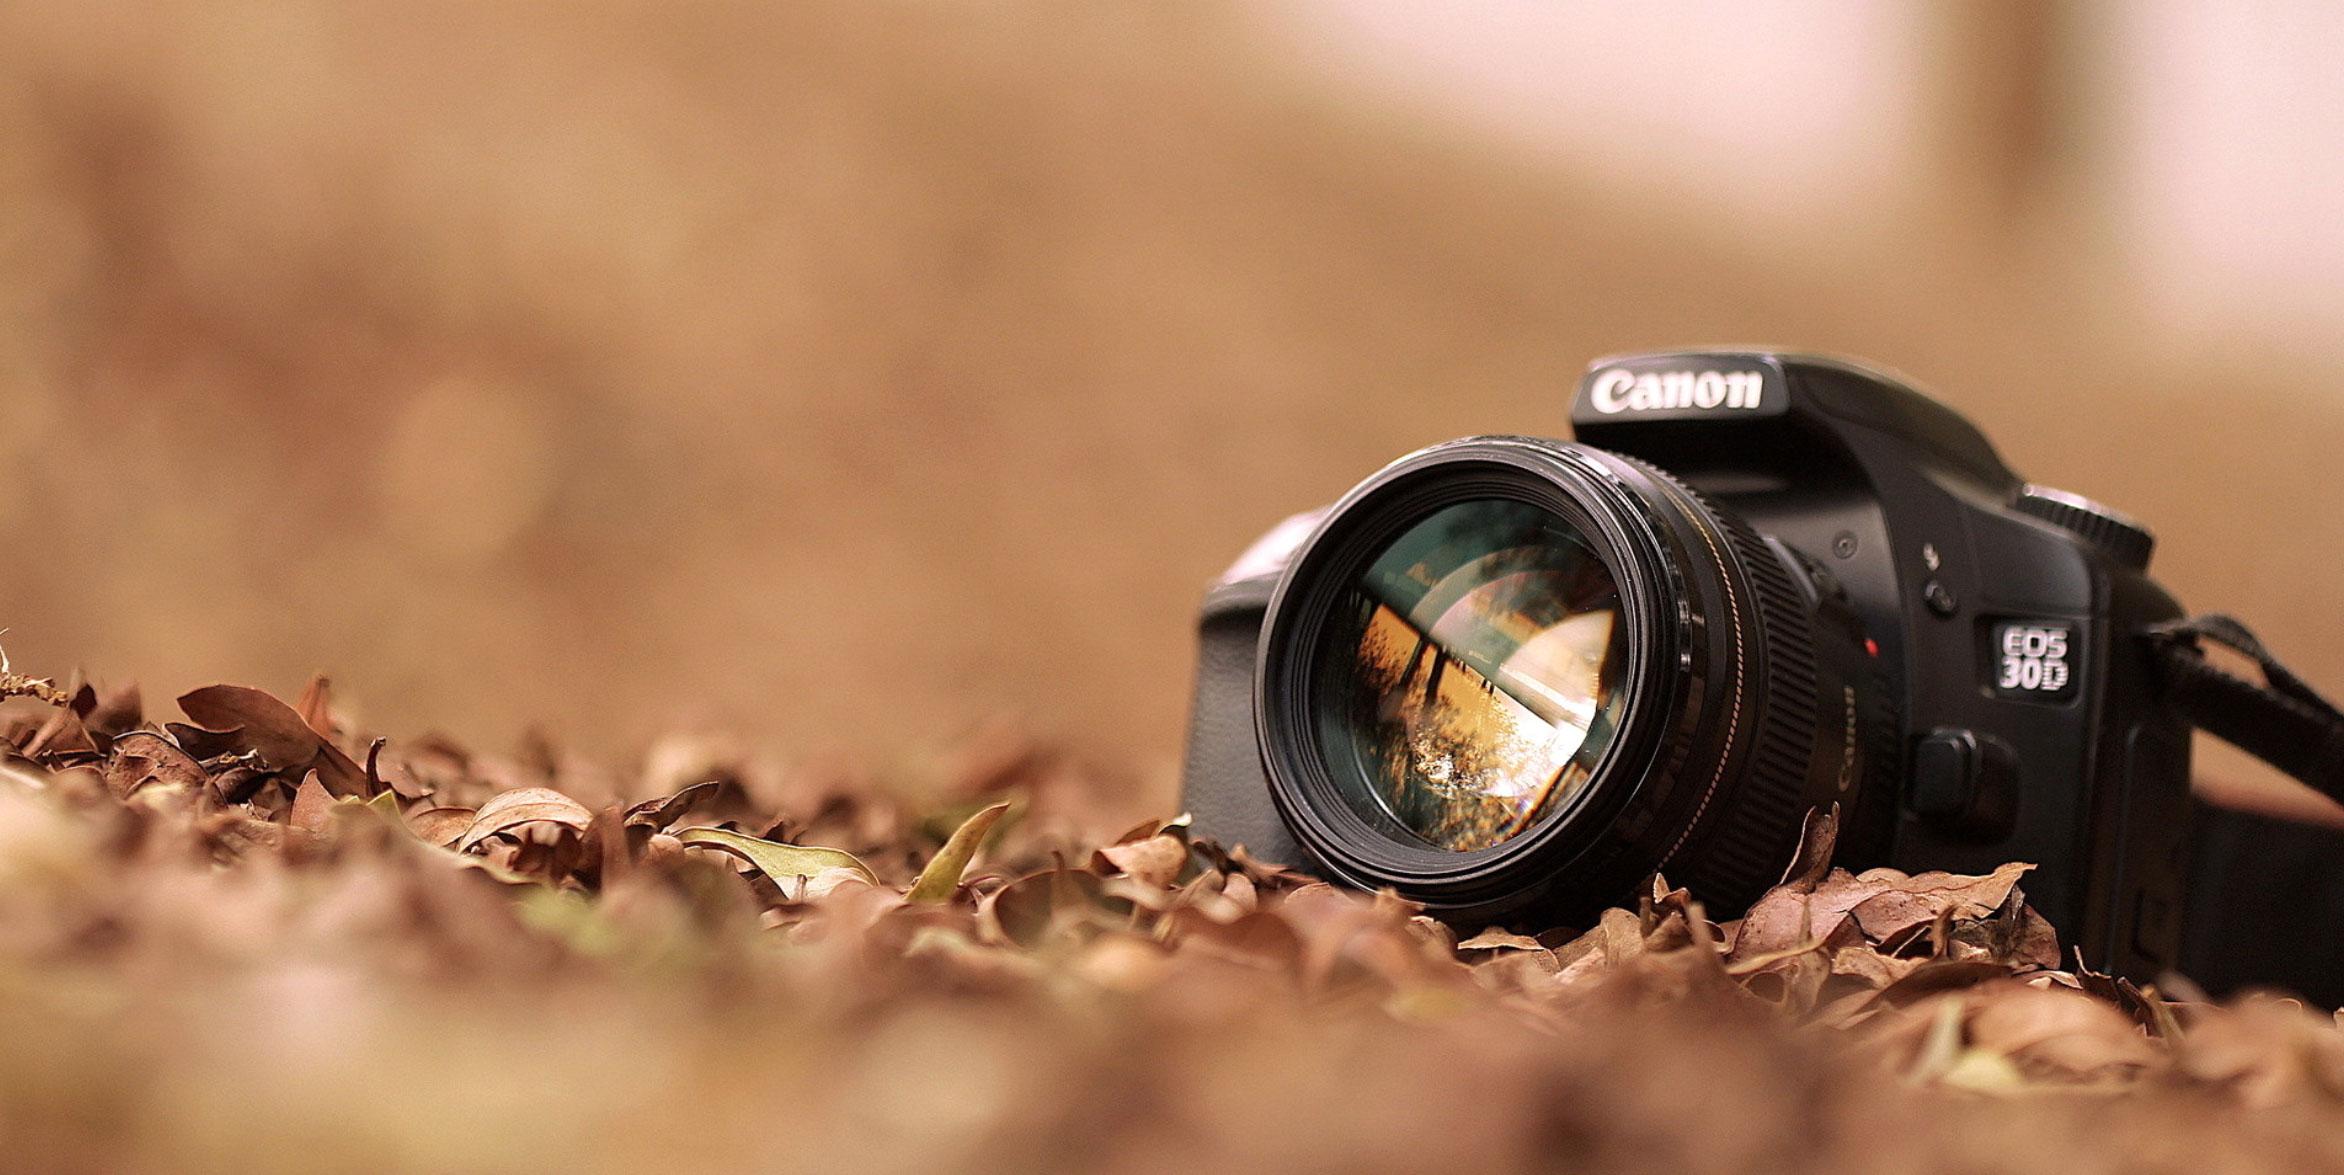 Canon selphy cp910 wireless compact photo printer Live Scan Fingerprinting - Passport/Visa/Citizenship/ID